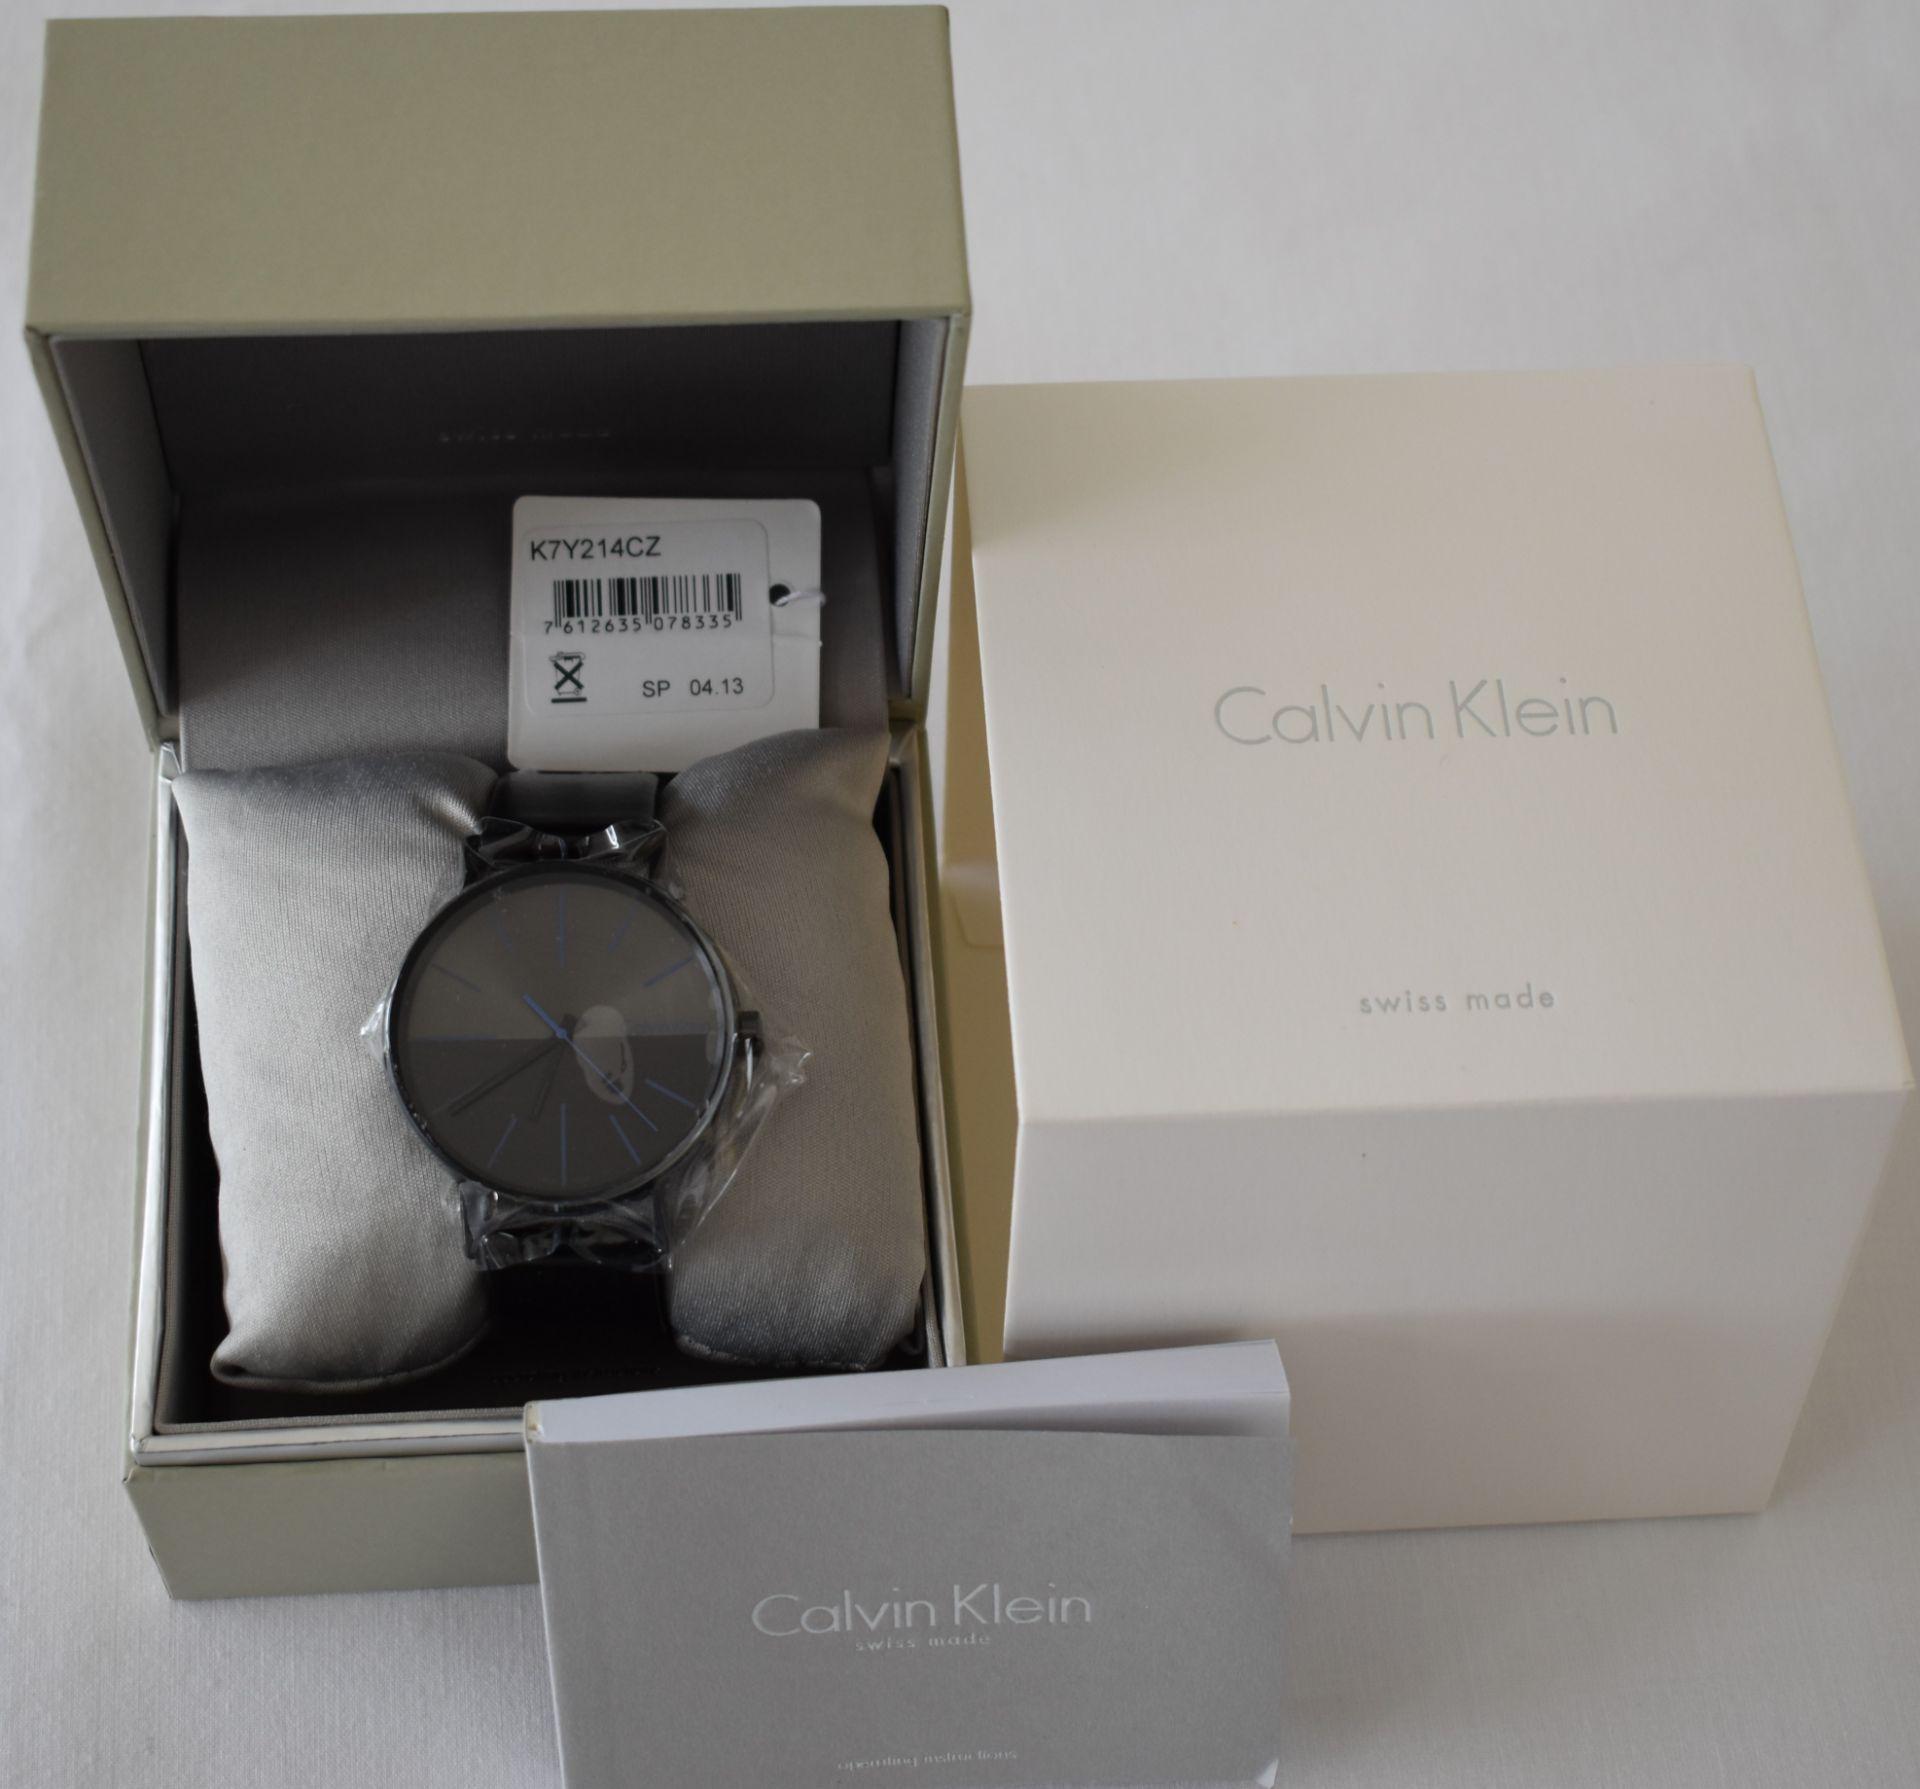 Calvin klein K7Y214CZ Men's Watch - Image 2 of 2